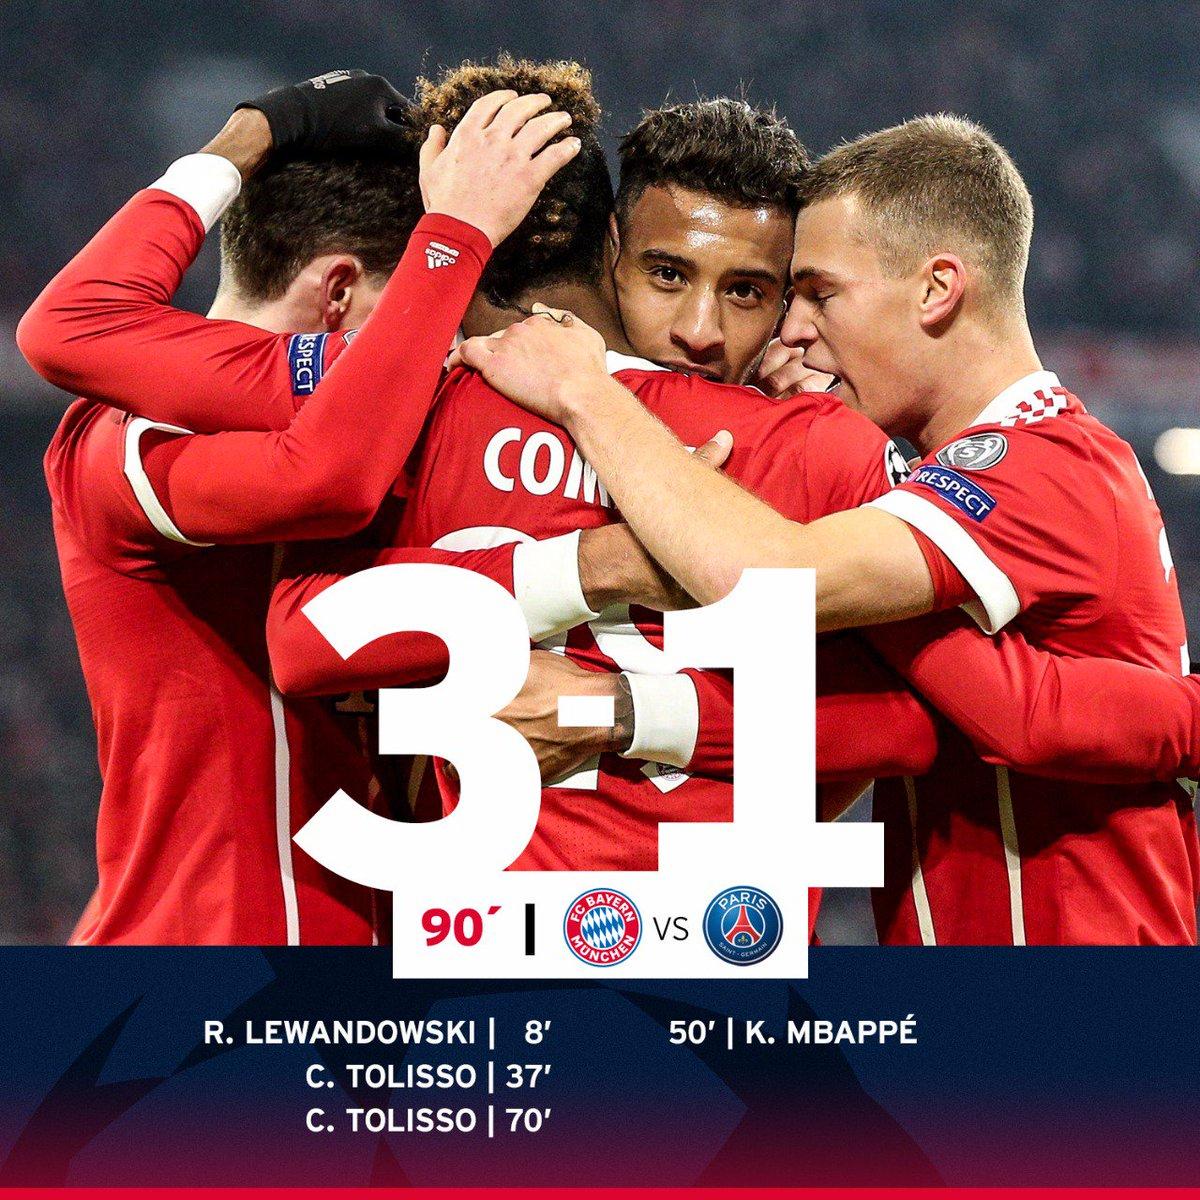 Chấm điểm trận Bayern Munchen 3-1 Paris Saint Germain